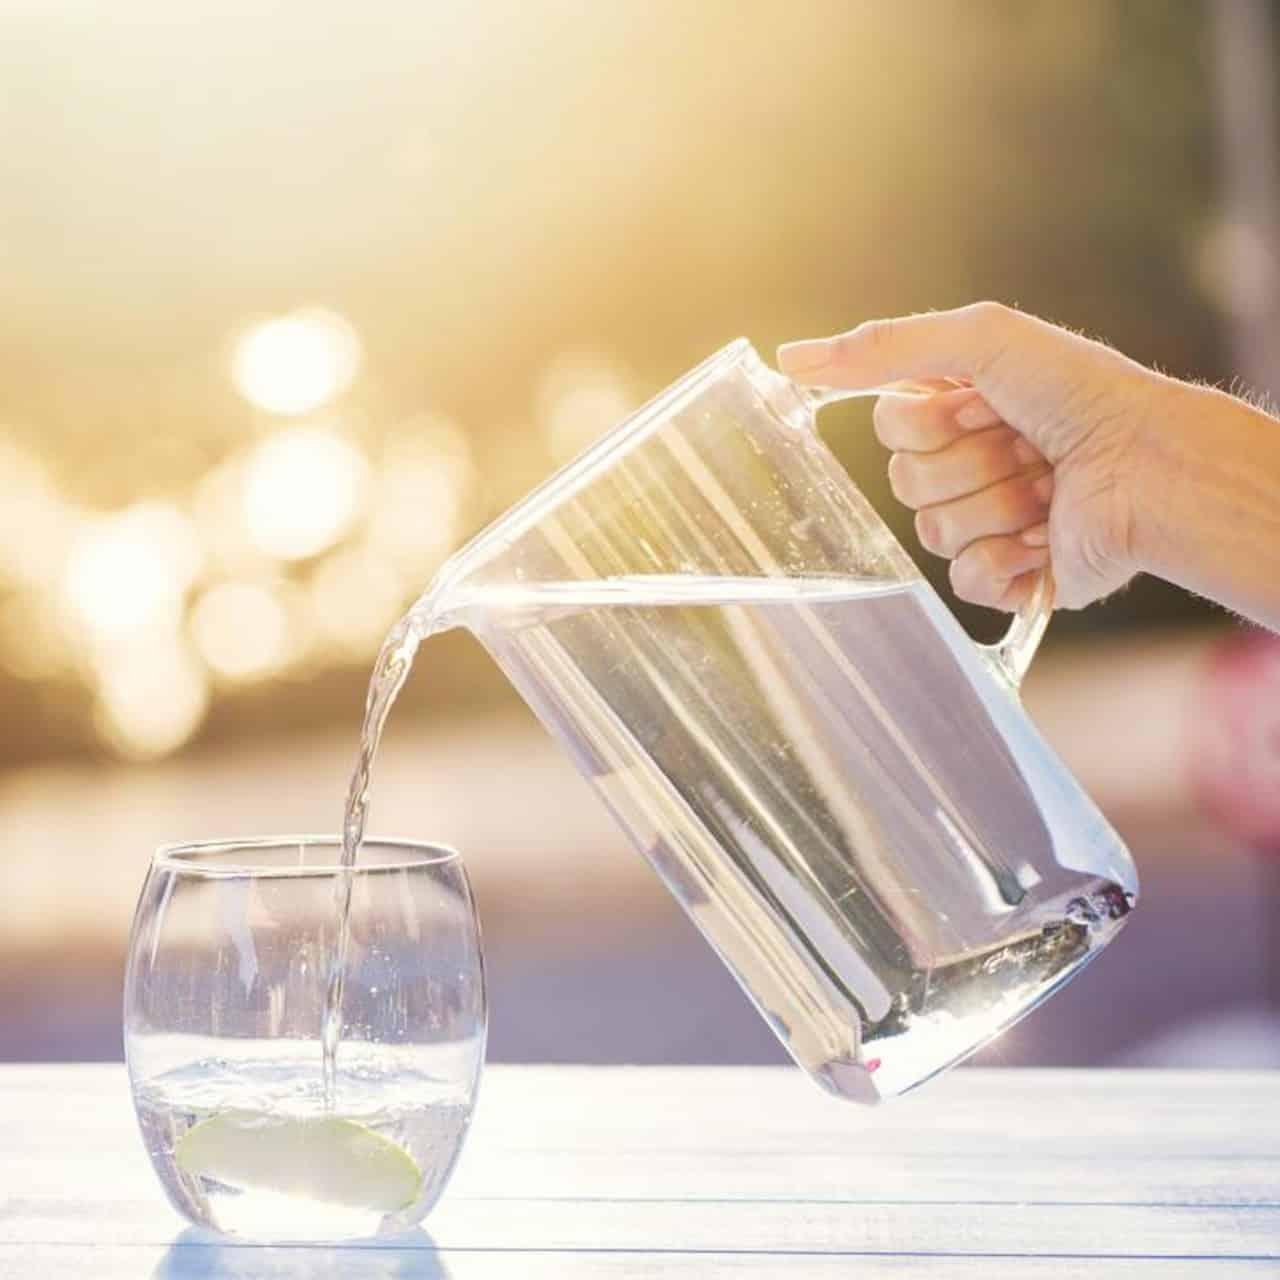 Tip 5 - varicose veins - Adequate Hydration